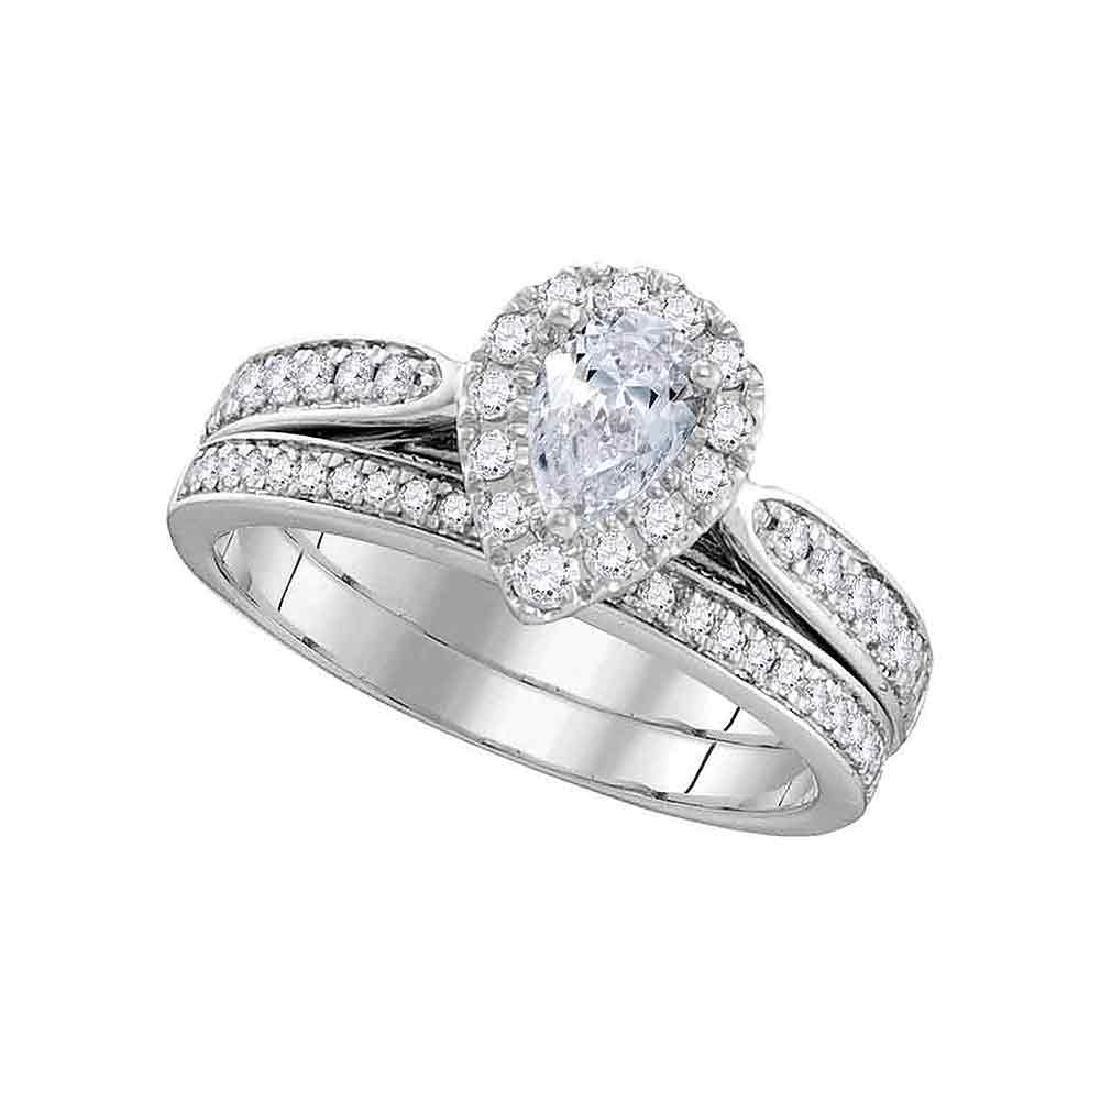 1 CTW Pear Diamond Bridal Wedding Engagement Ring 14KT